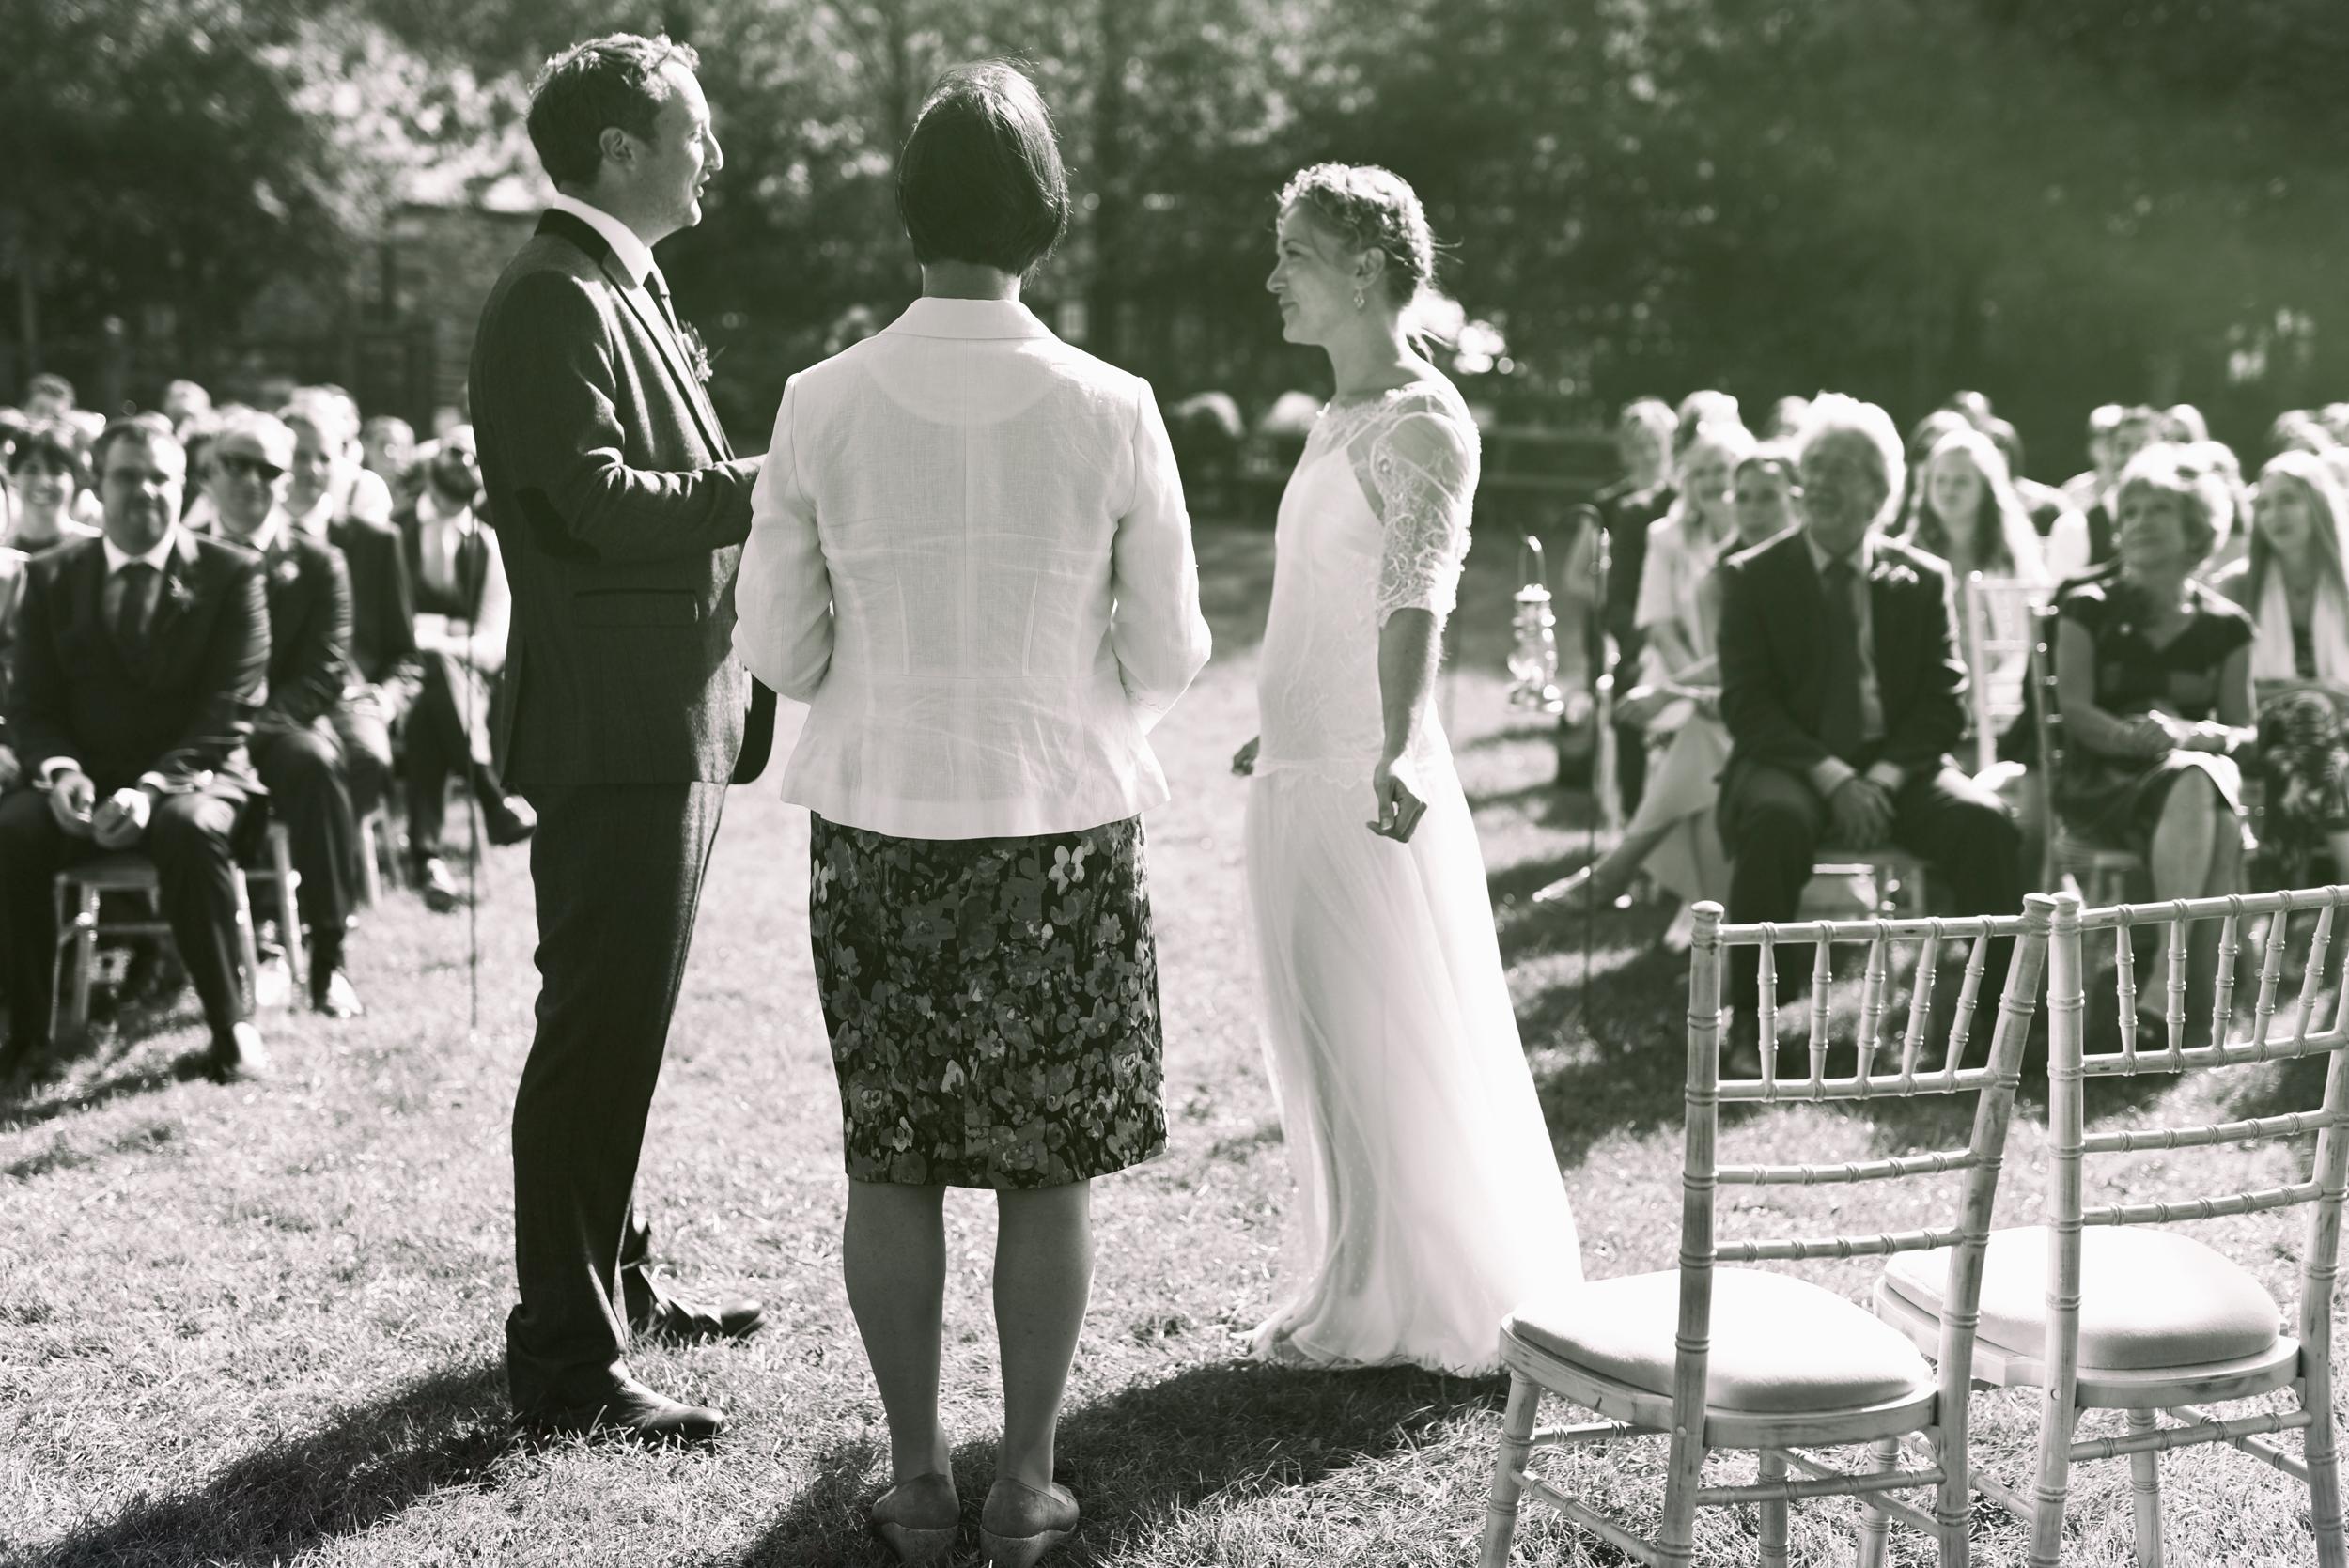 Miriam-Bespoke-Lace-Wedding-Dress-Kate-Beaumont-Sheffield-4.jpg